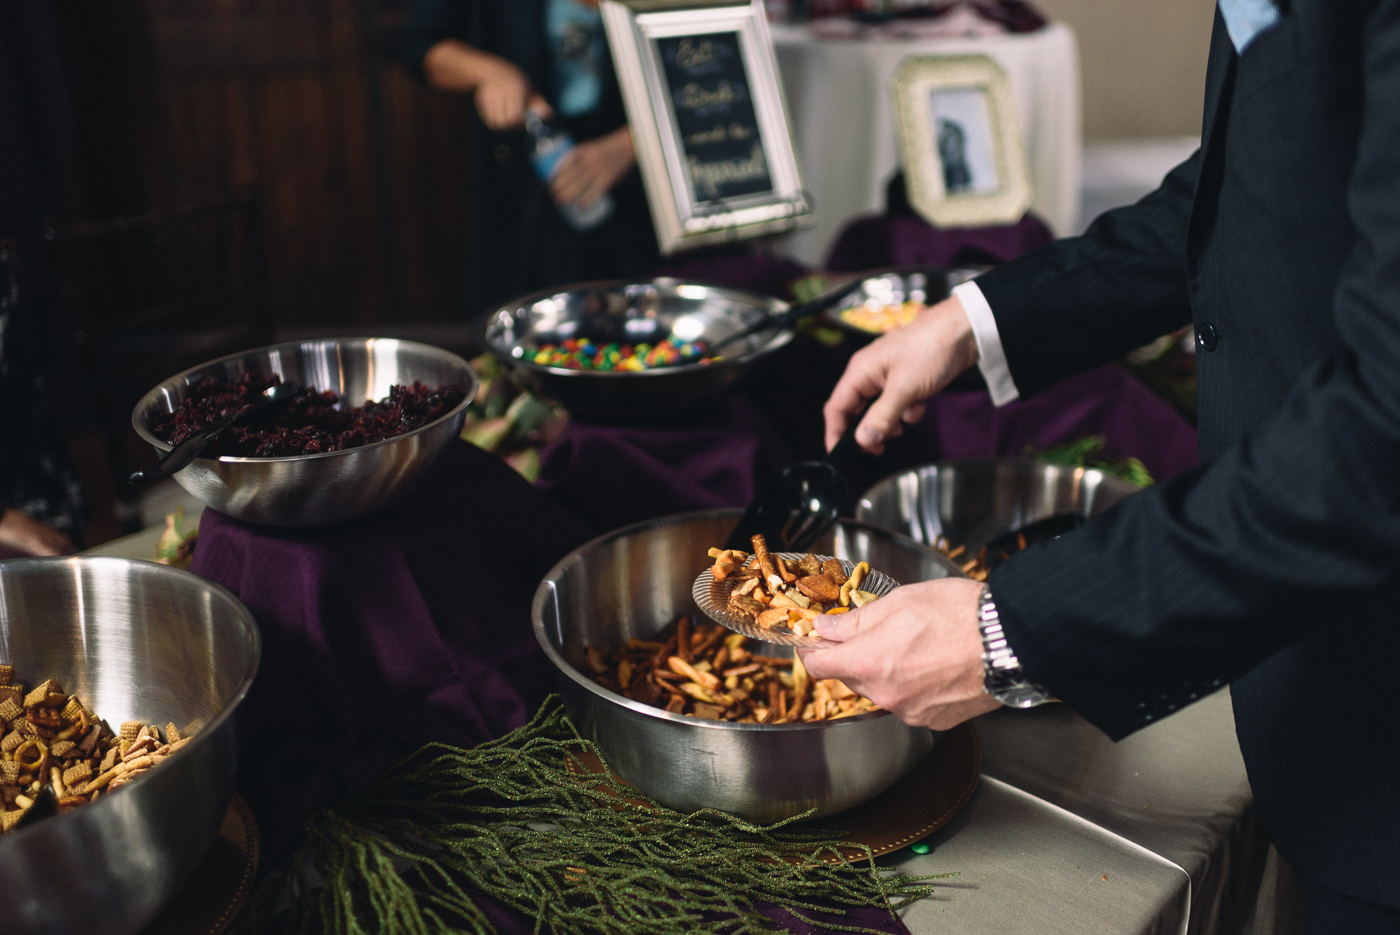 wedding reception snack table pretzels M&Ms craisins